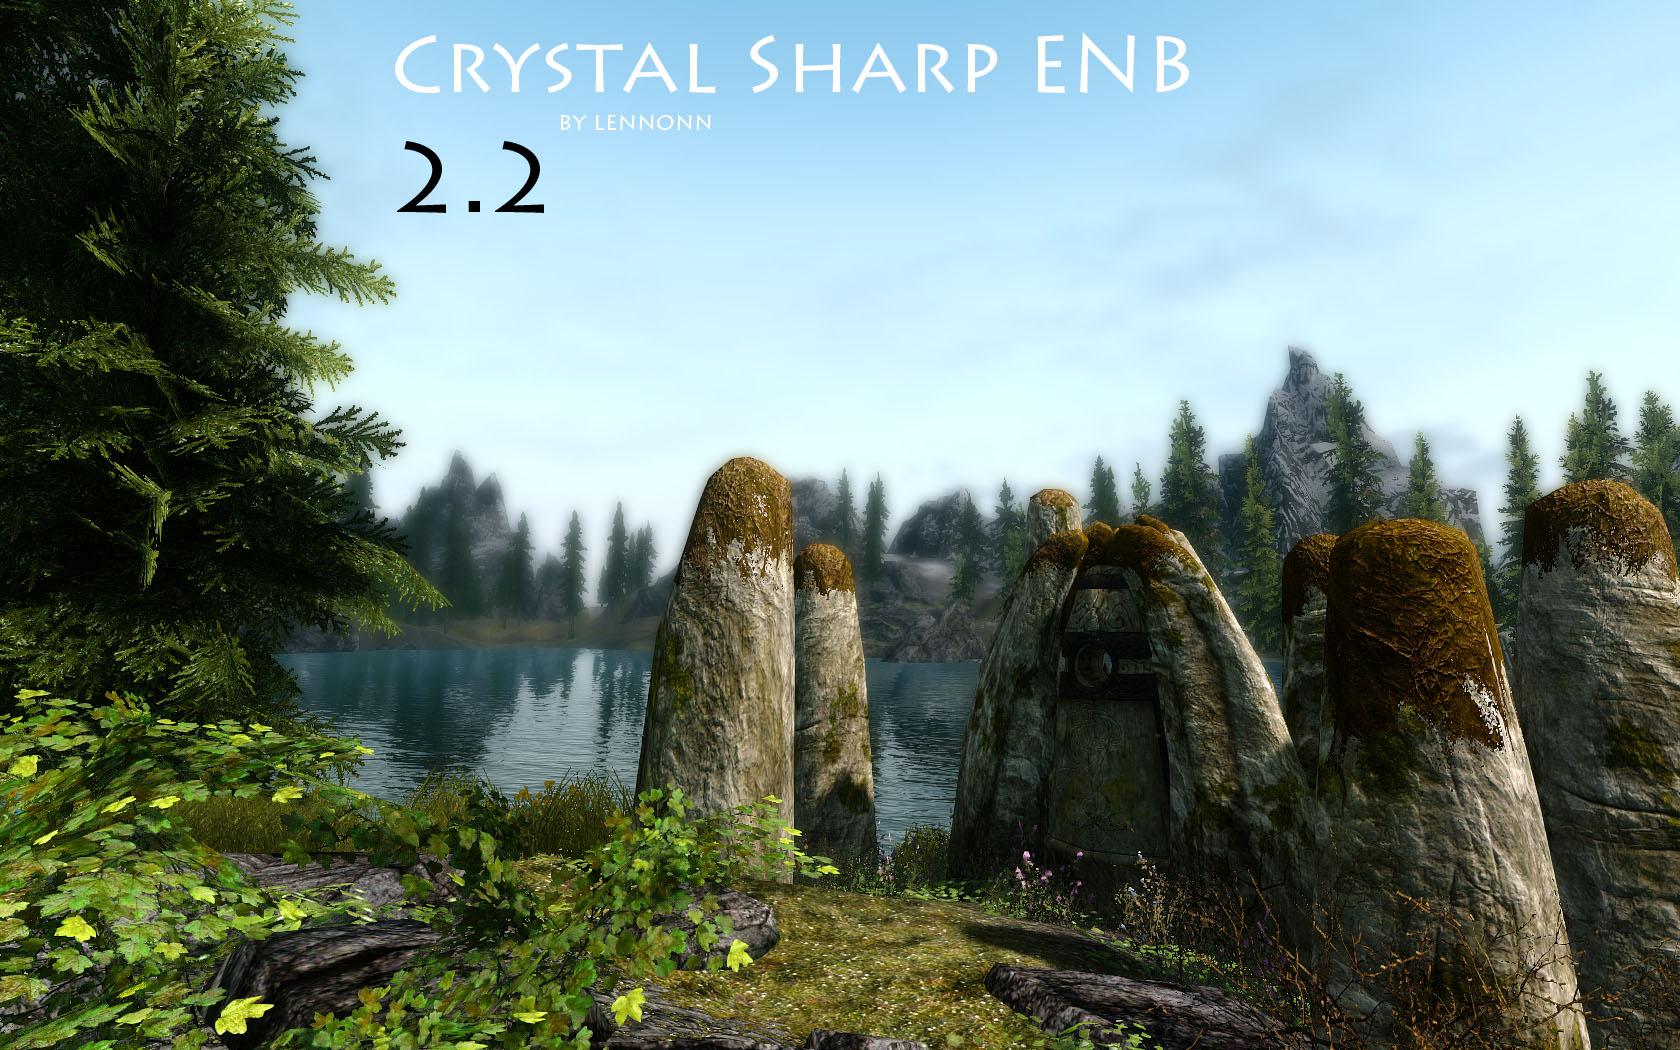 000215.jpg - Elder Scrolls 5: Skyrim, the